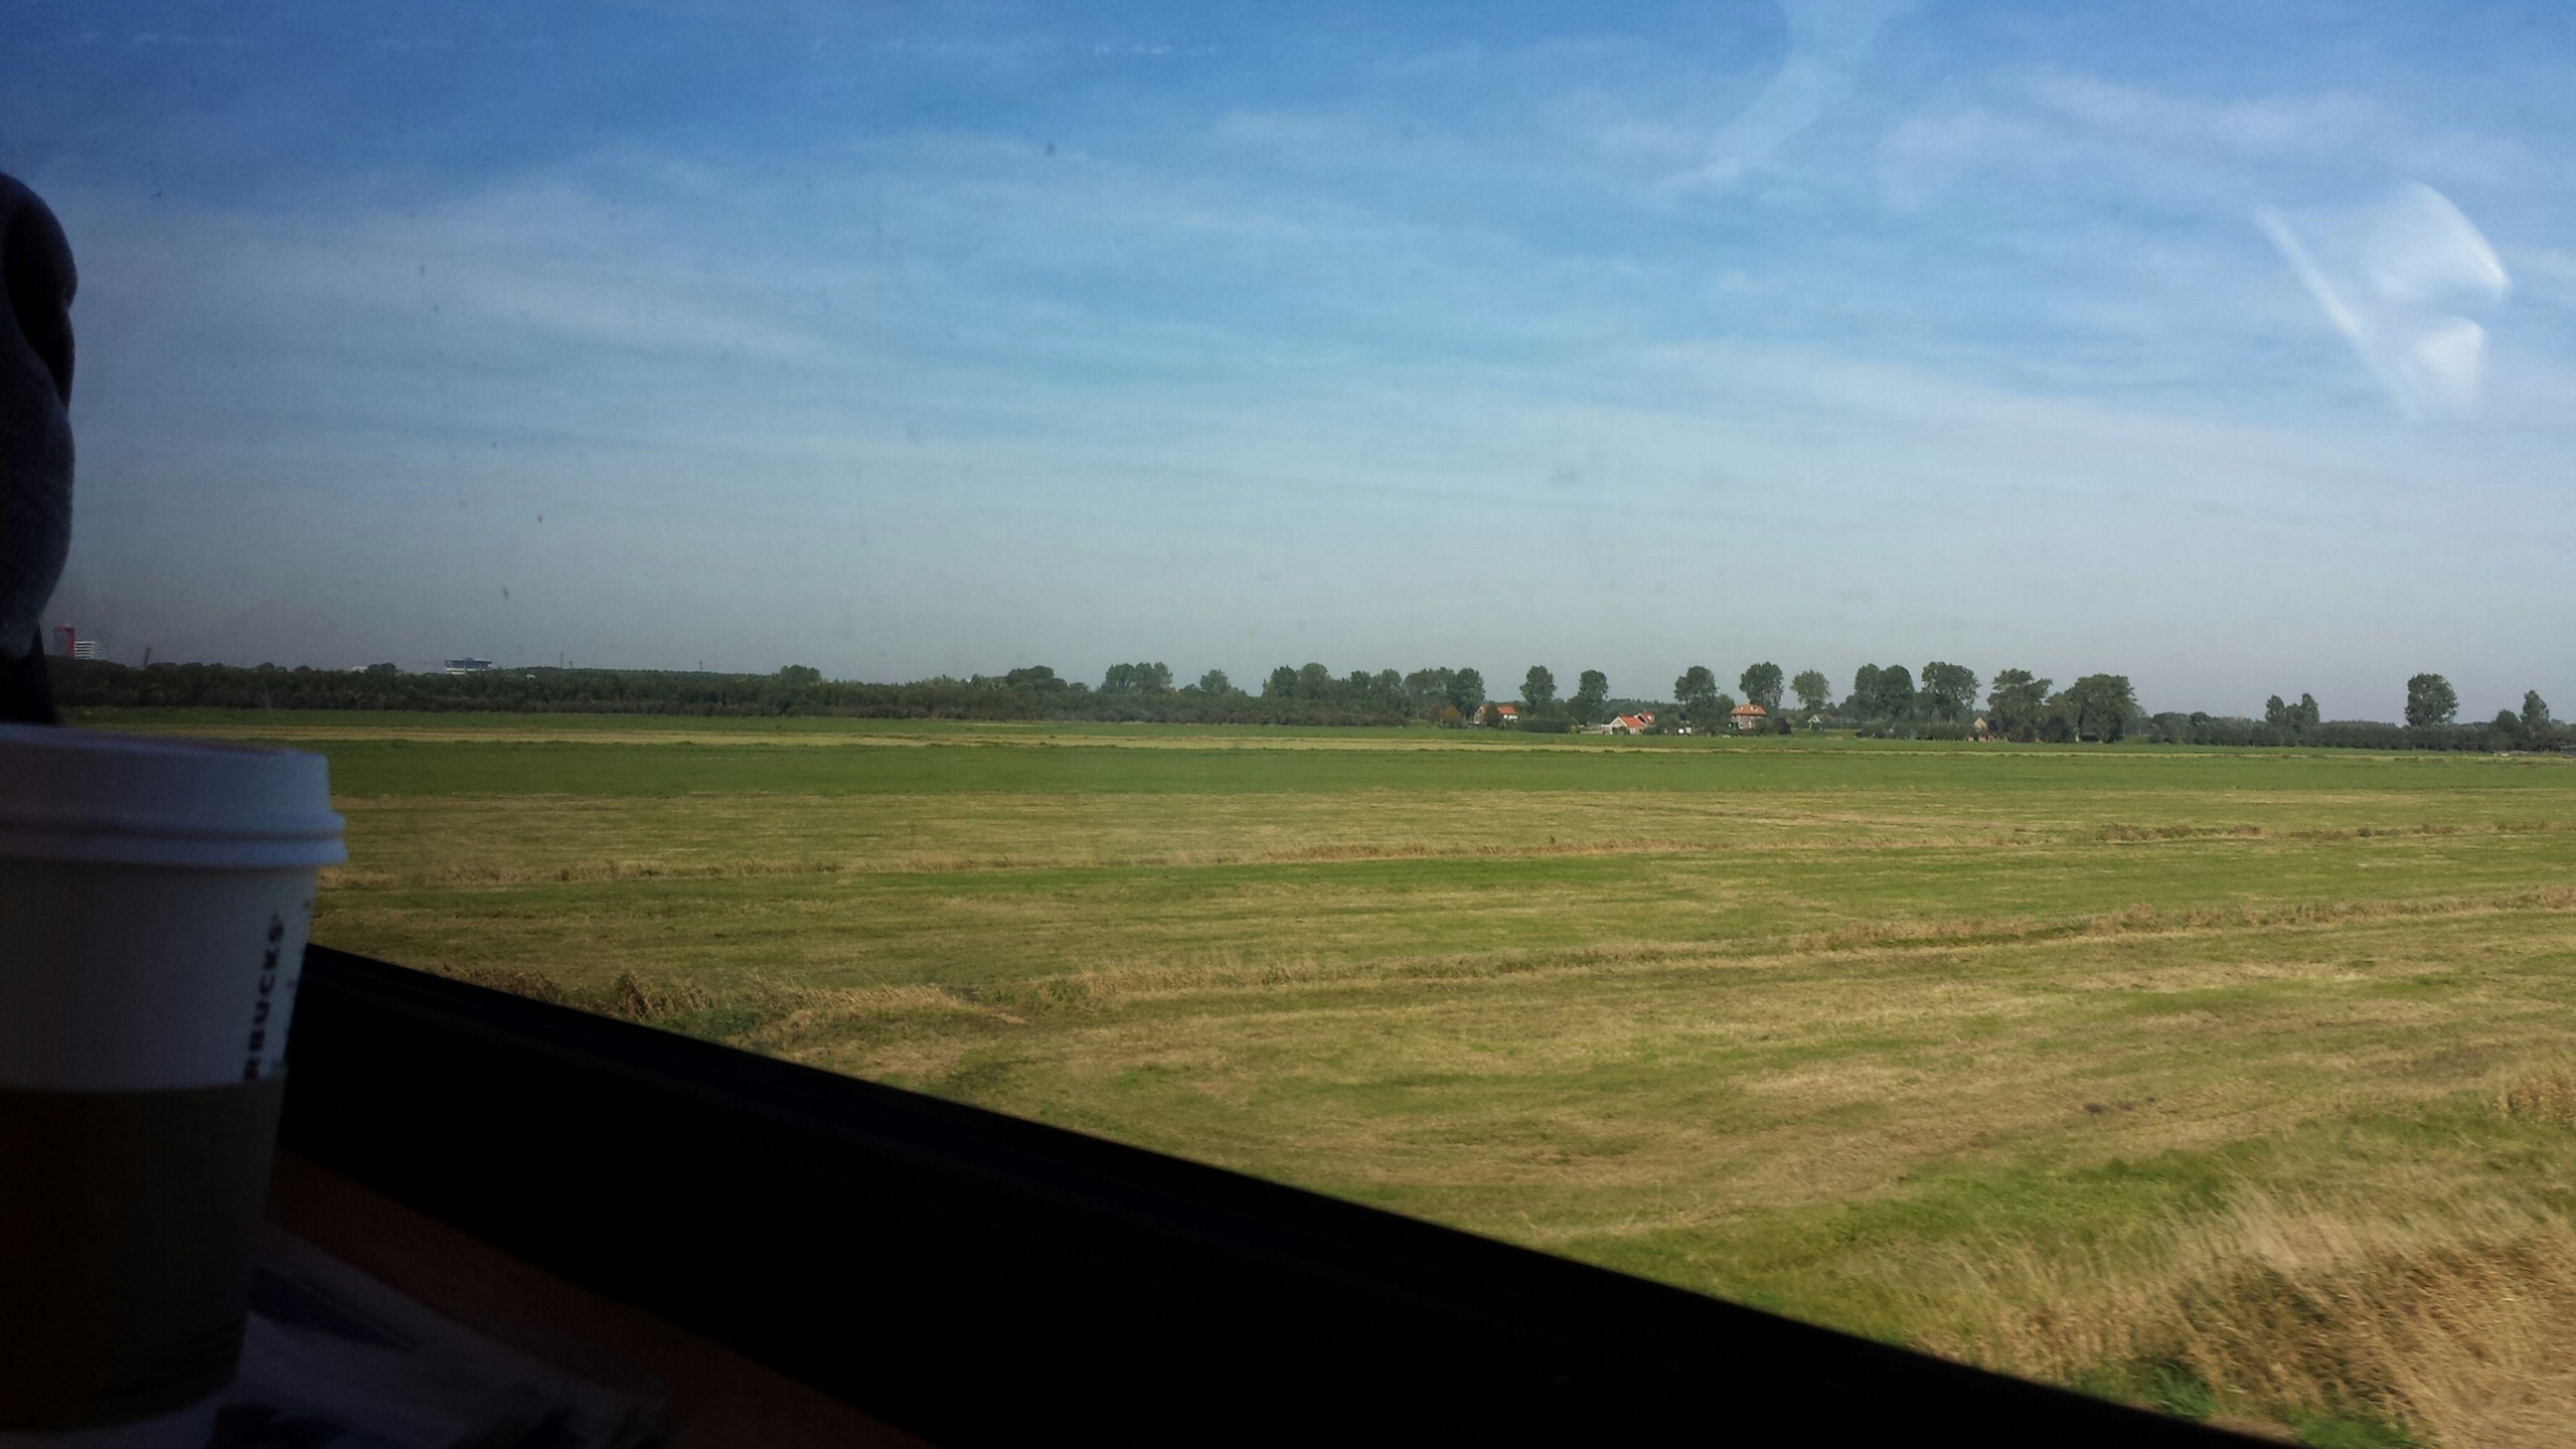 Train Sky Holland Duurtlang Omw 2 WizKhalifa